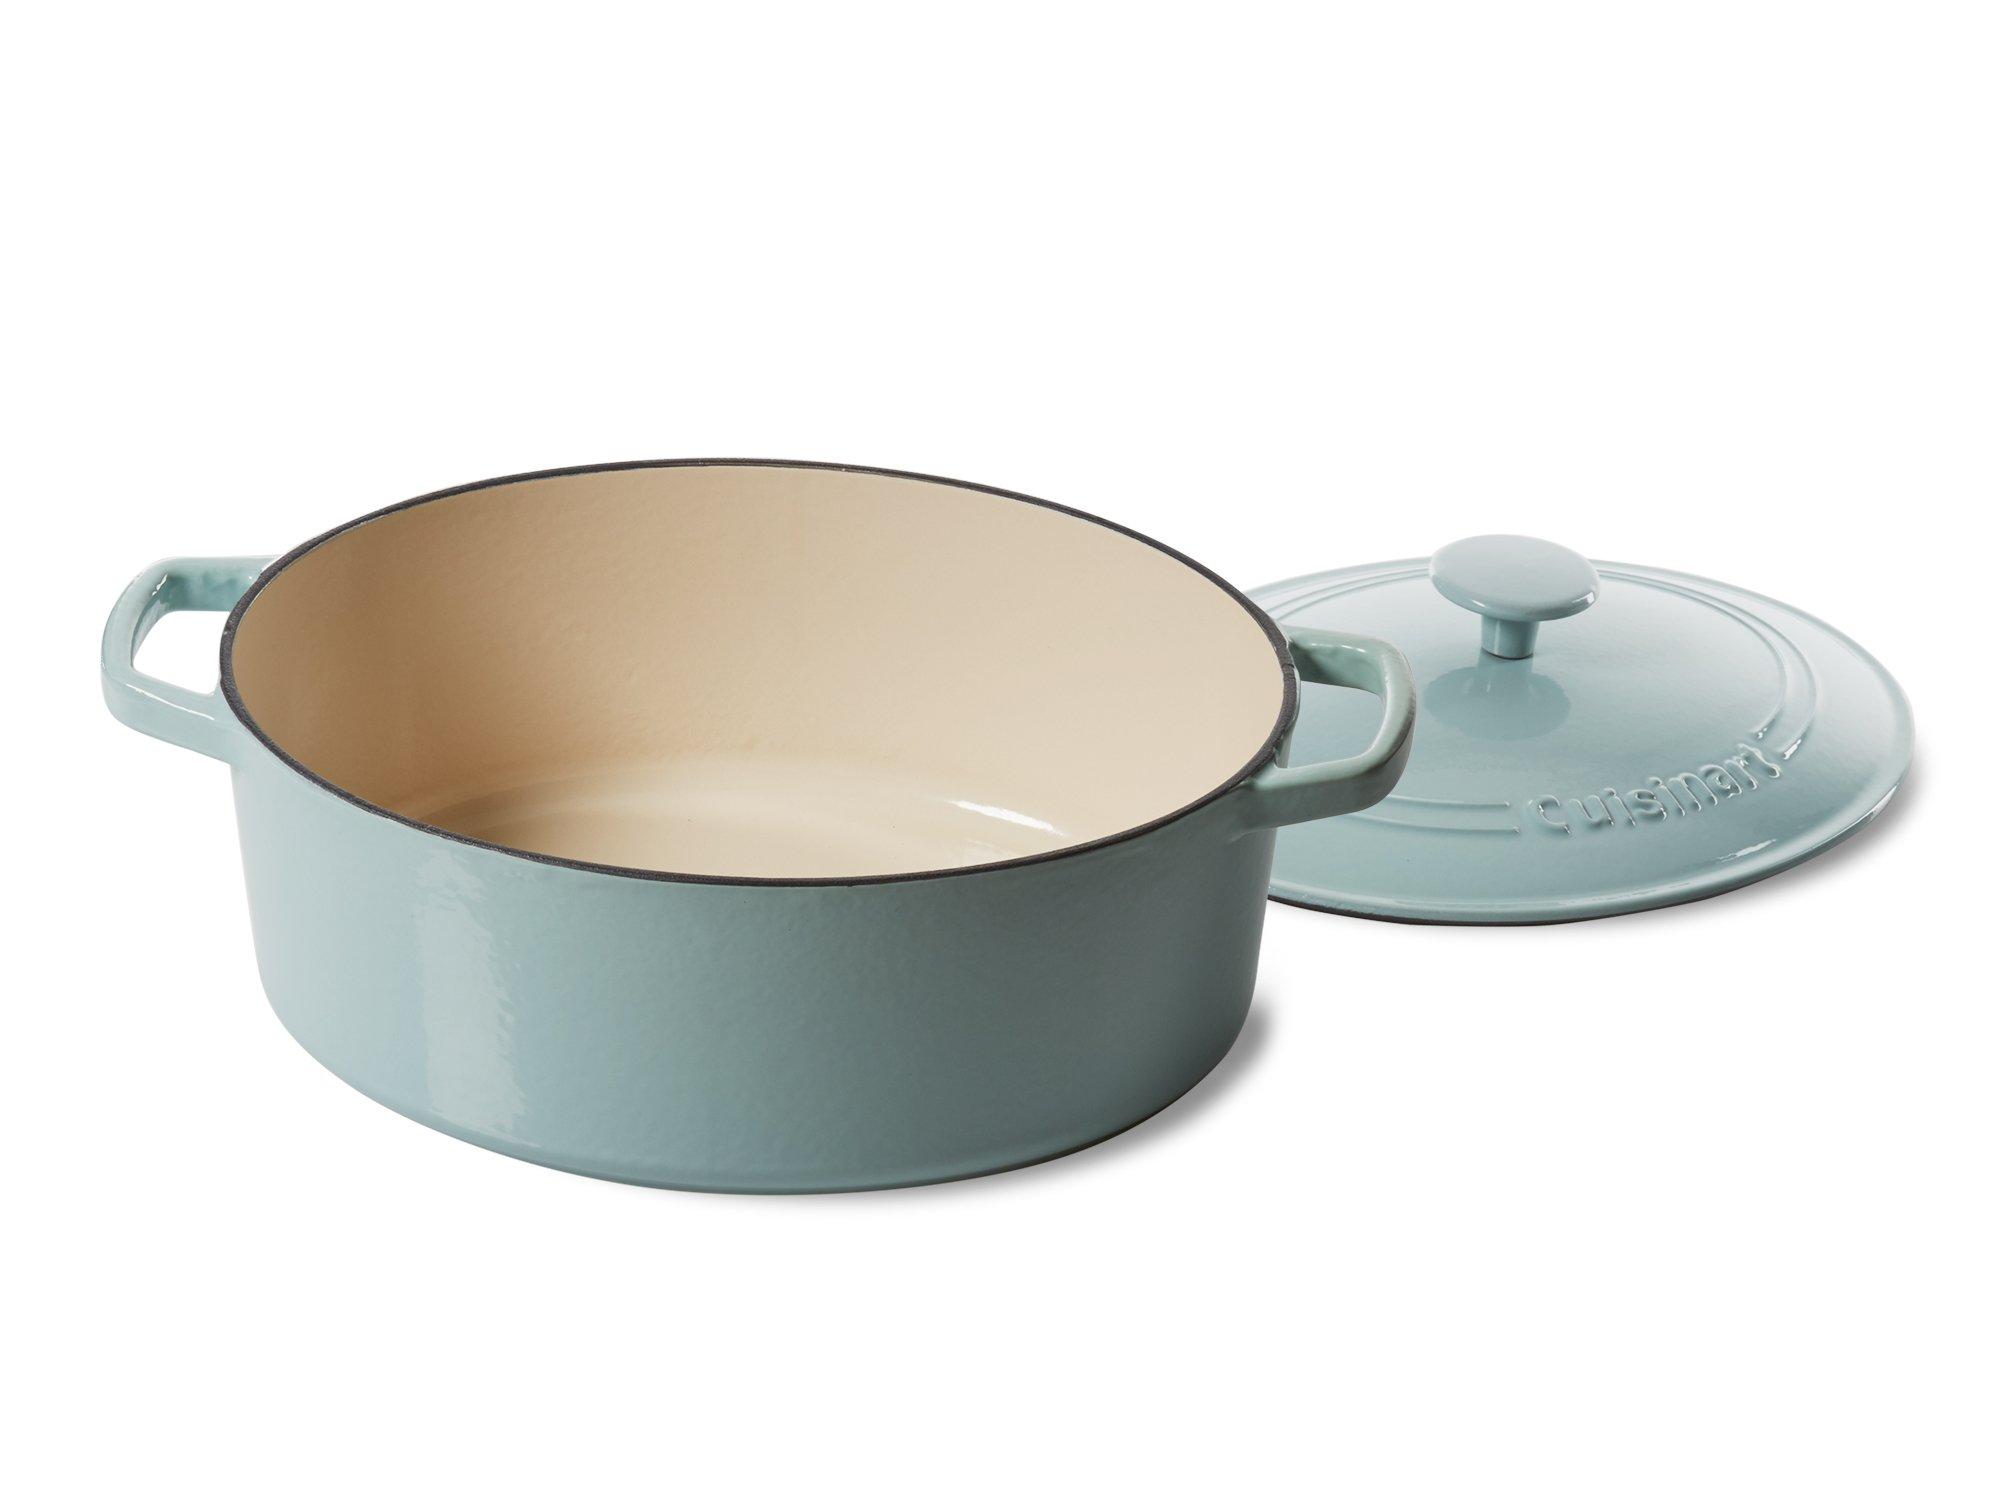 Cuisinart 5.5 Qt. Casserole Cast Iron, Light Blue by Cuisinart (Image #2)